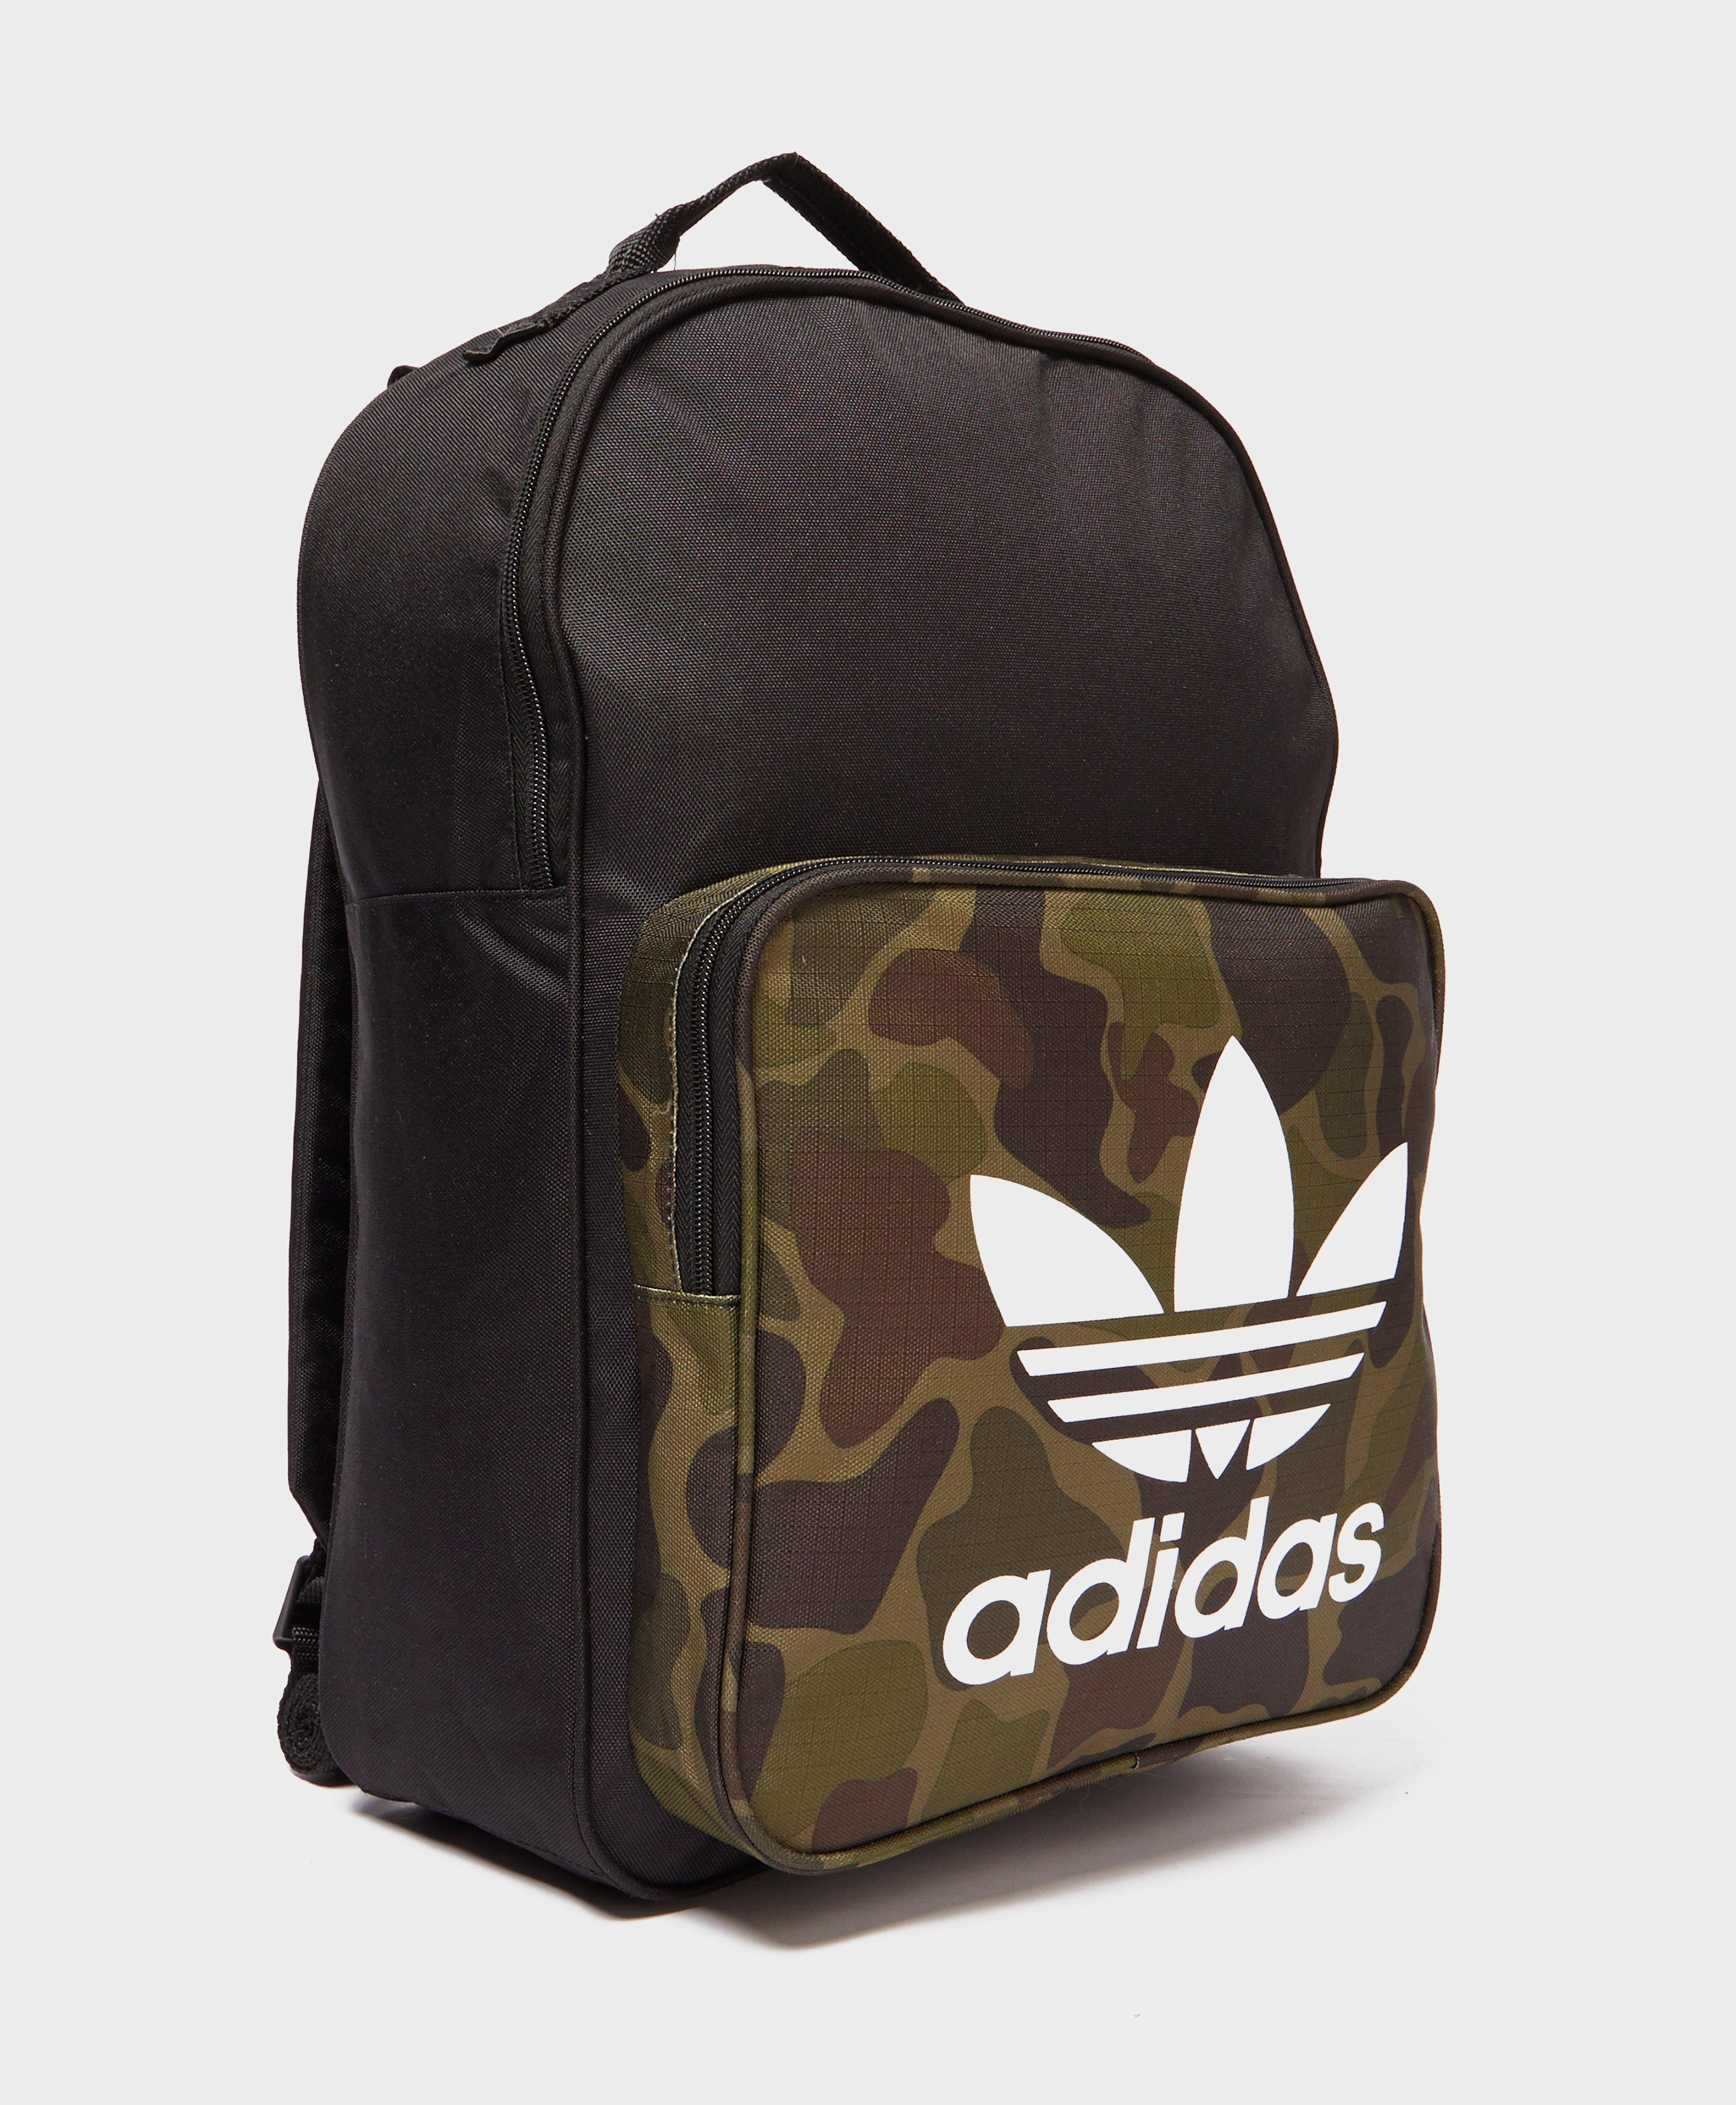 new york 21c3a 3c350 Adidas Originals Classic Camo Backpack for Men - Lyst